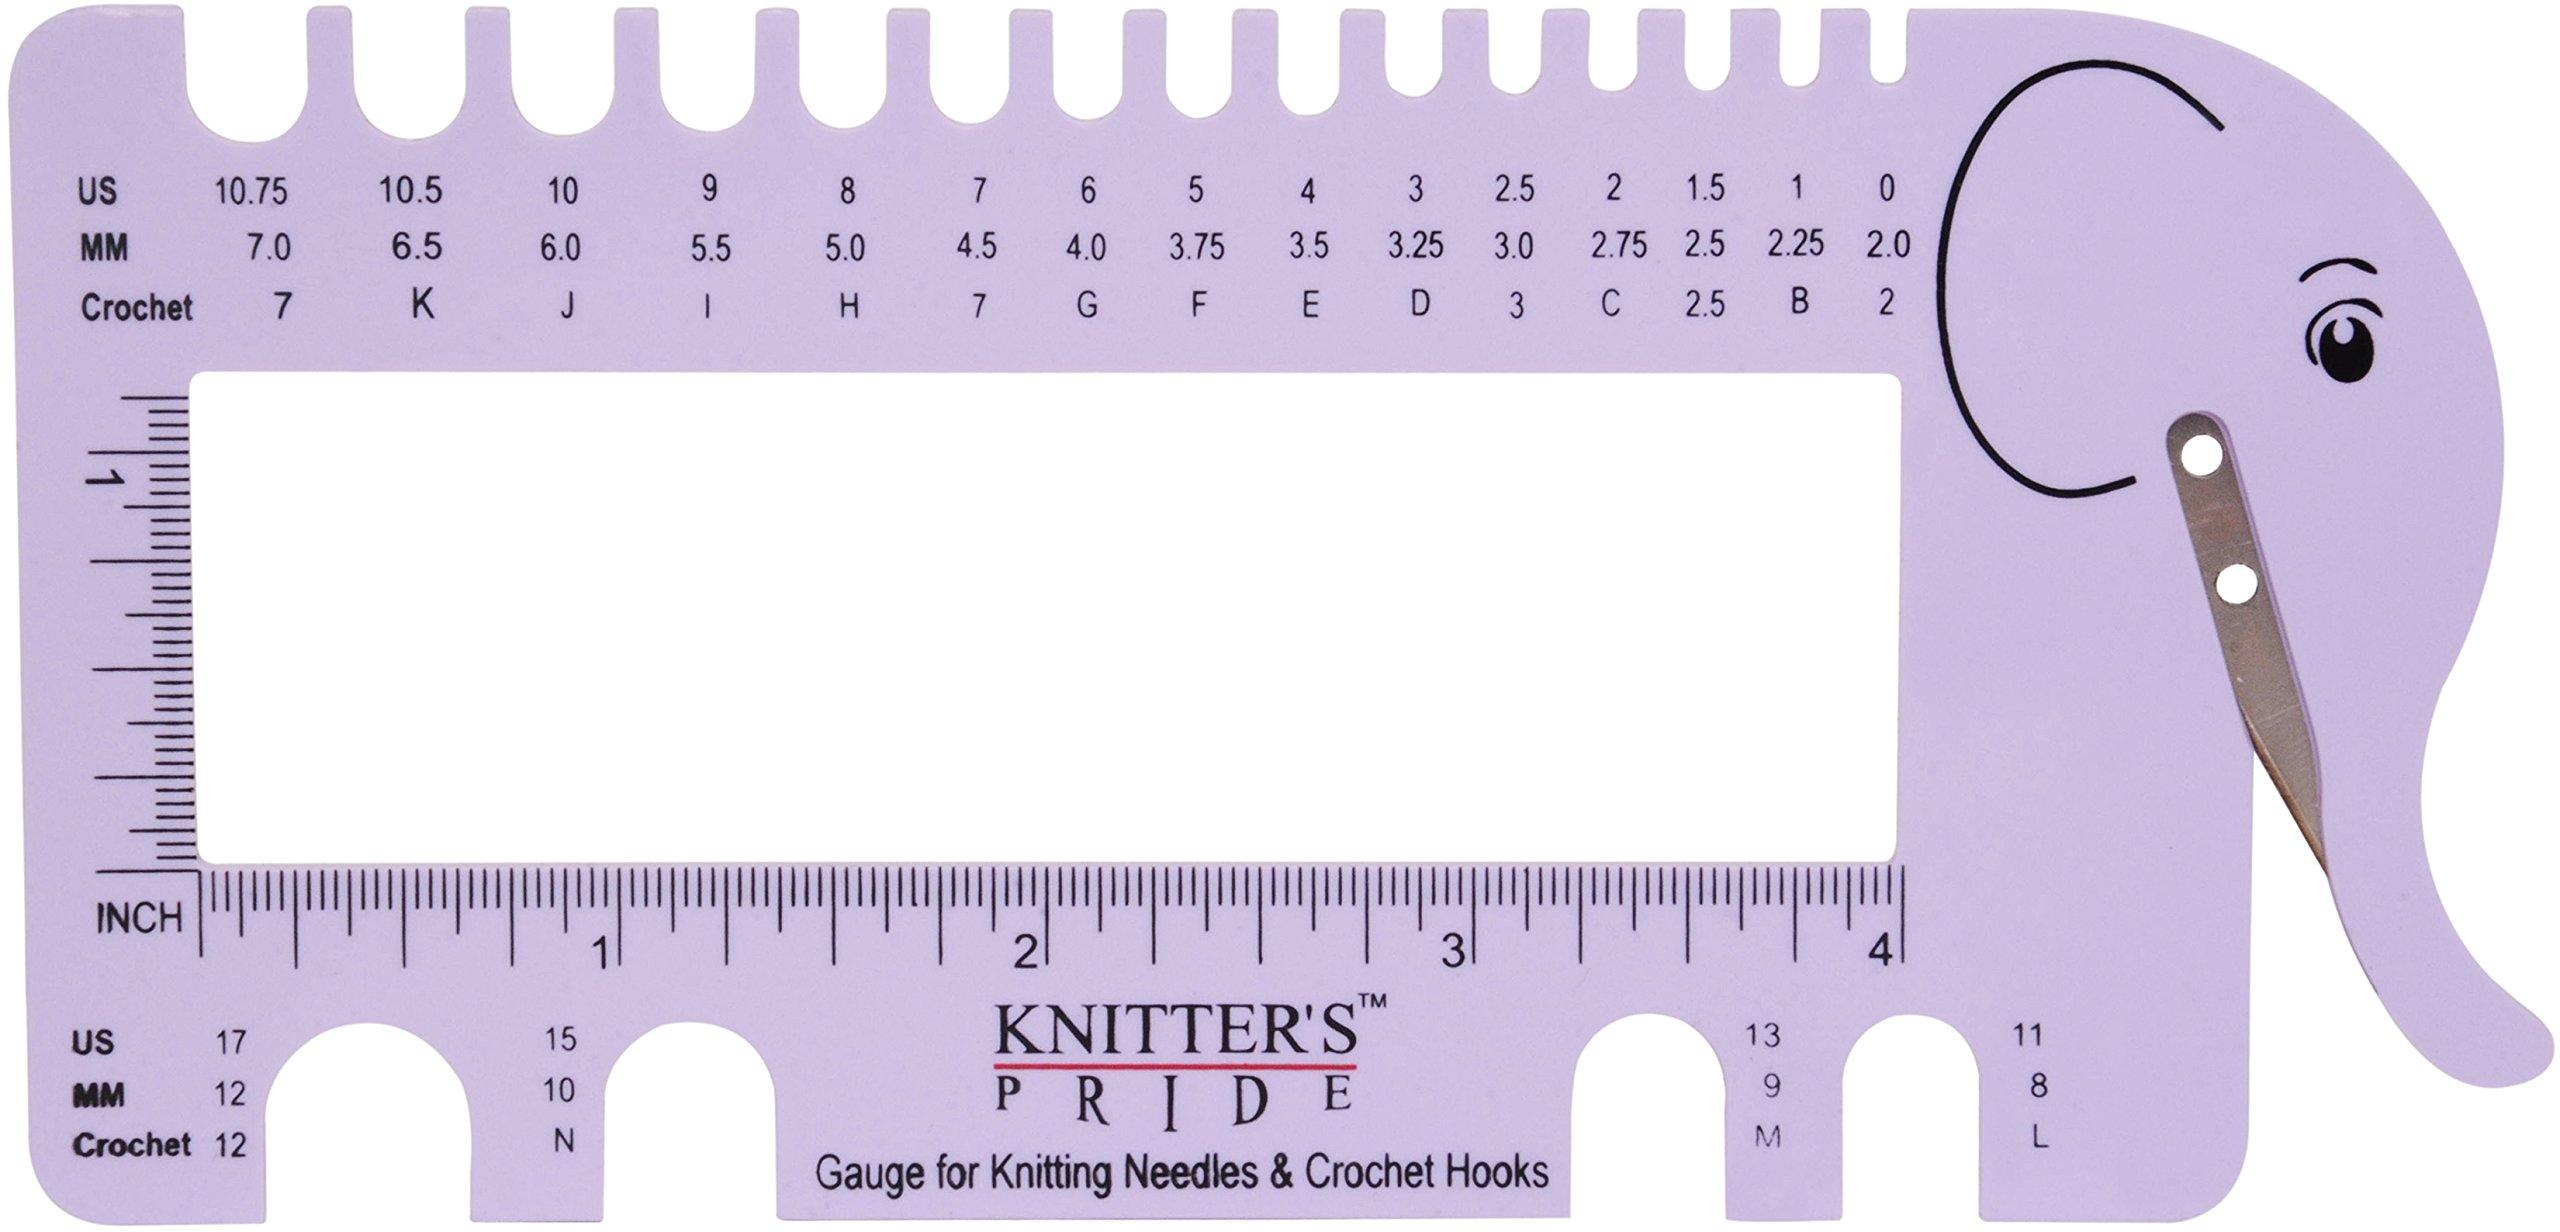 Knitters Pride - Kp800224 Vista de aguja y Crochet Sizer ...